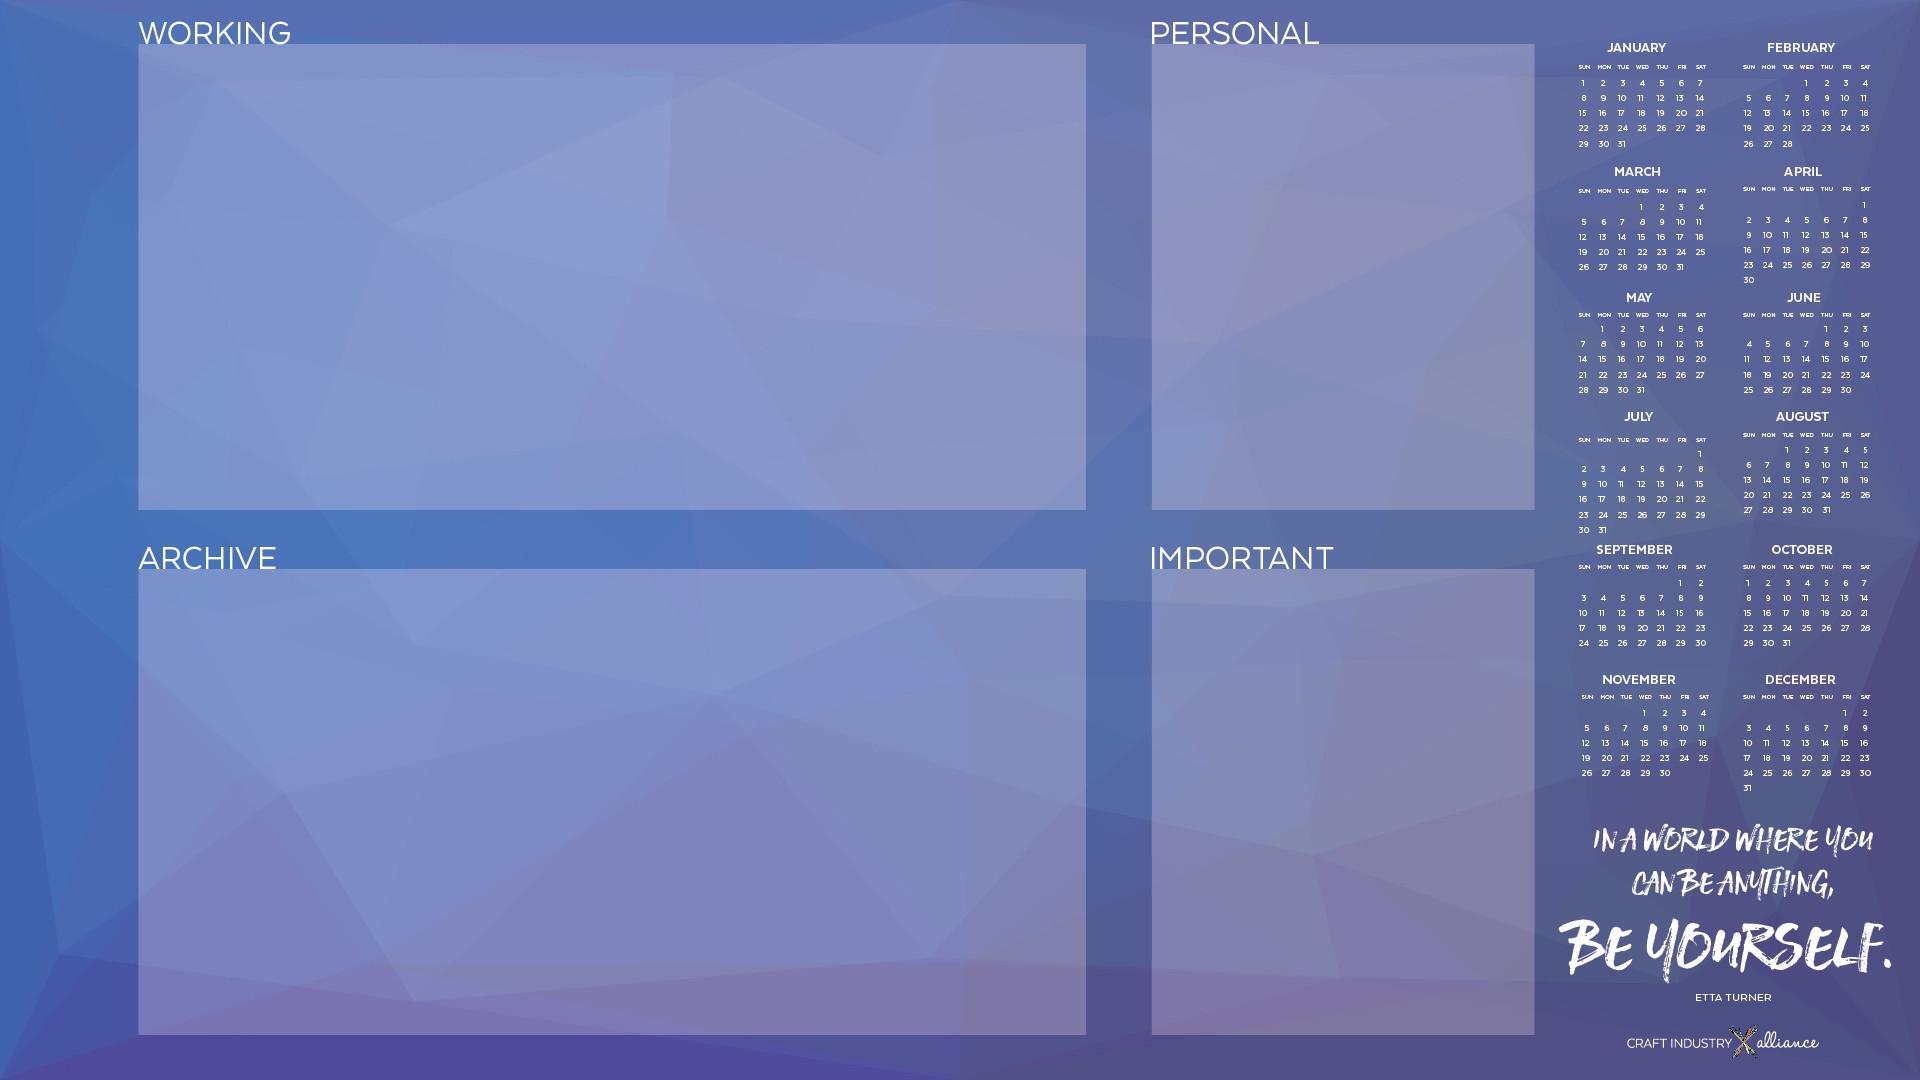 Desktop Organizer Wallpaper (66+ images)